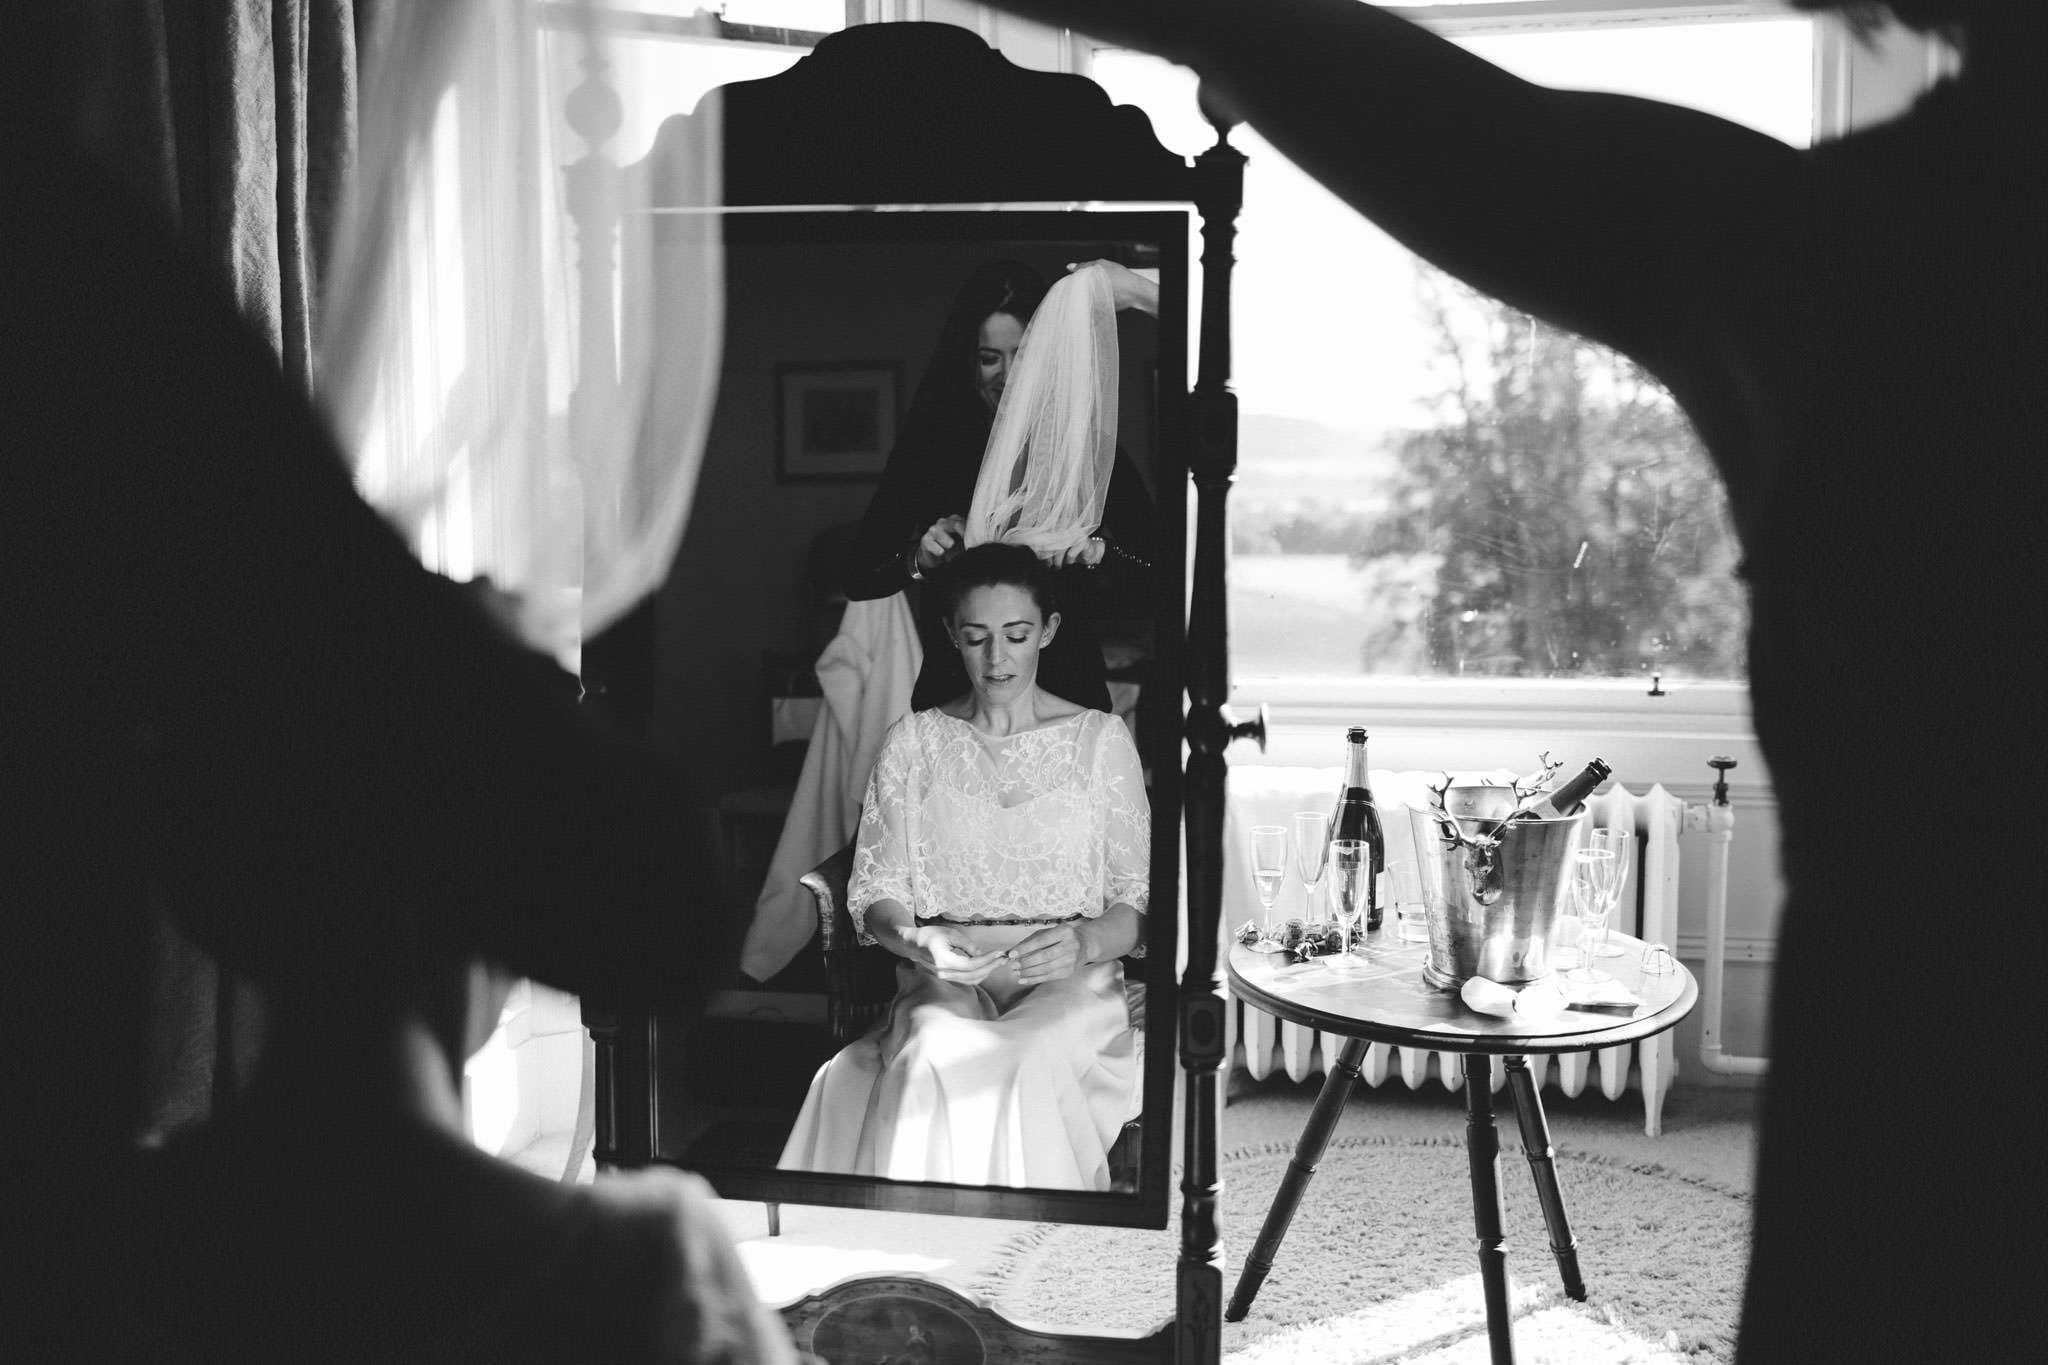 fine-art-wedding-photography-scotland 031